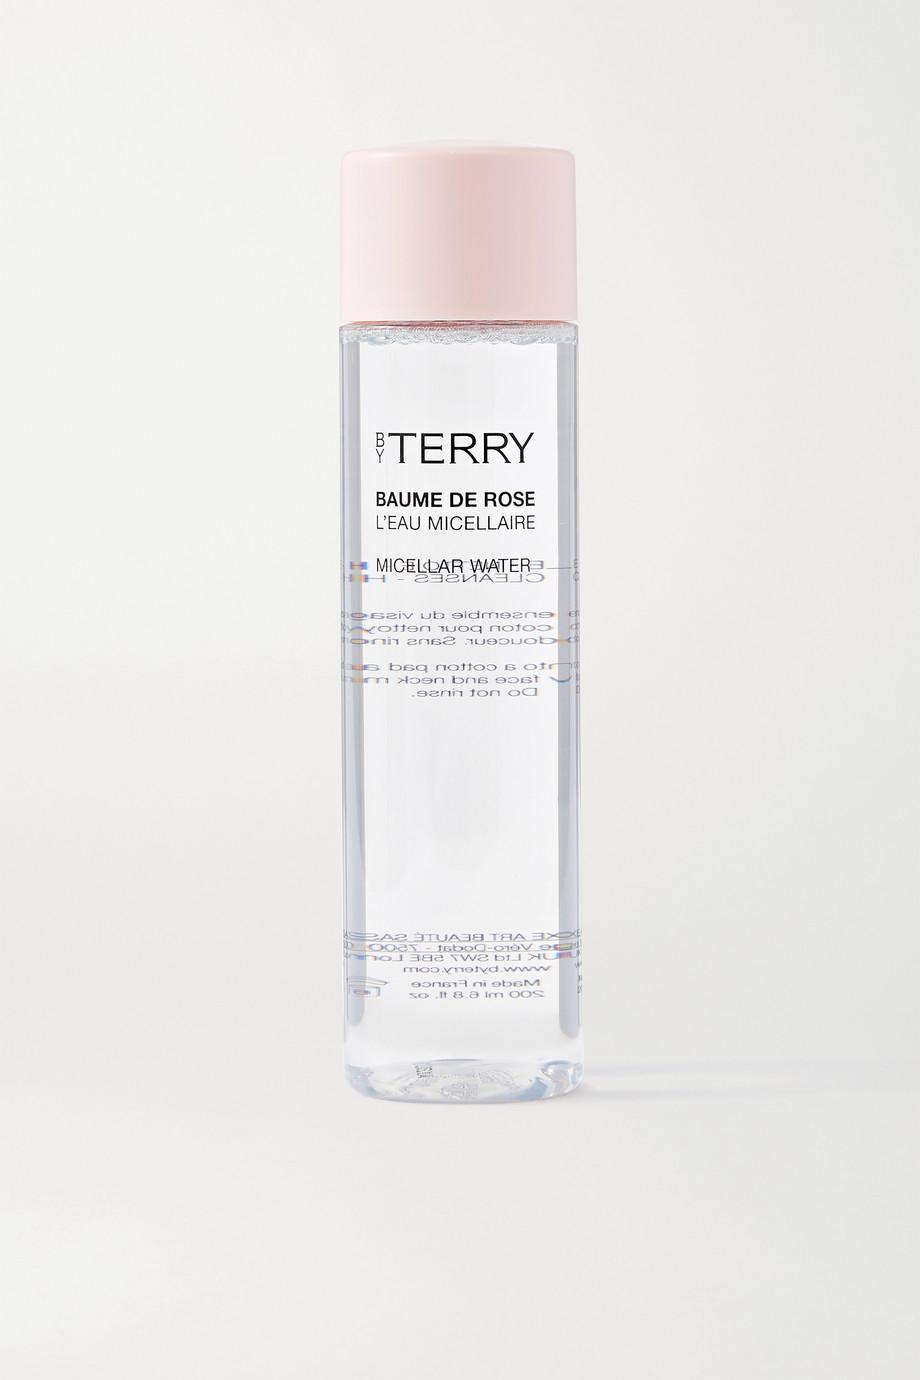 BY TERRY Baume de Rose Micellar Water, 200 ml – Mizellenwasser